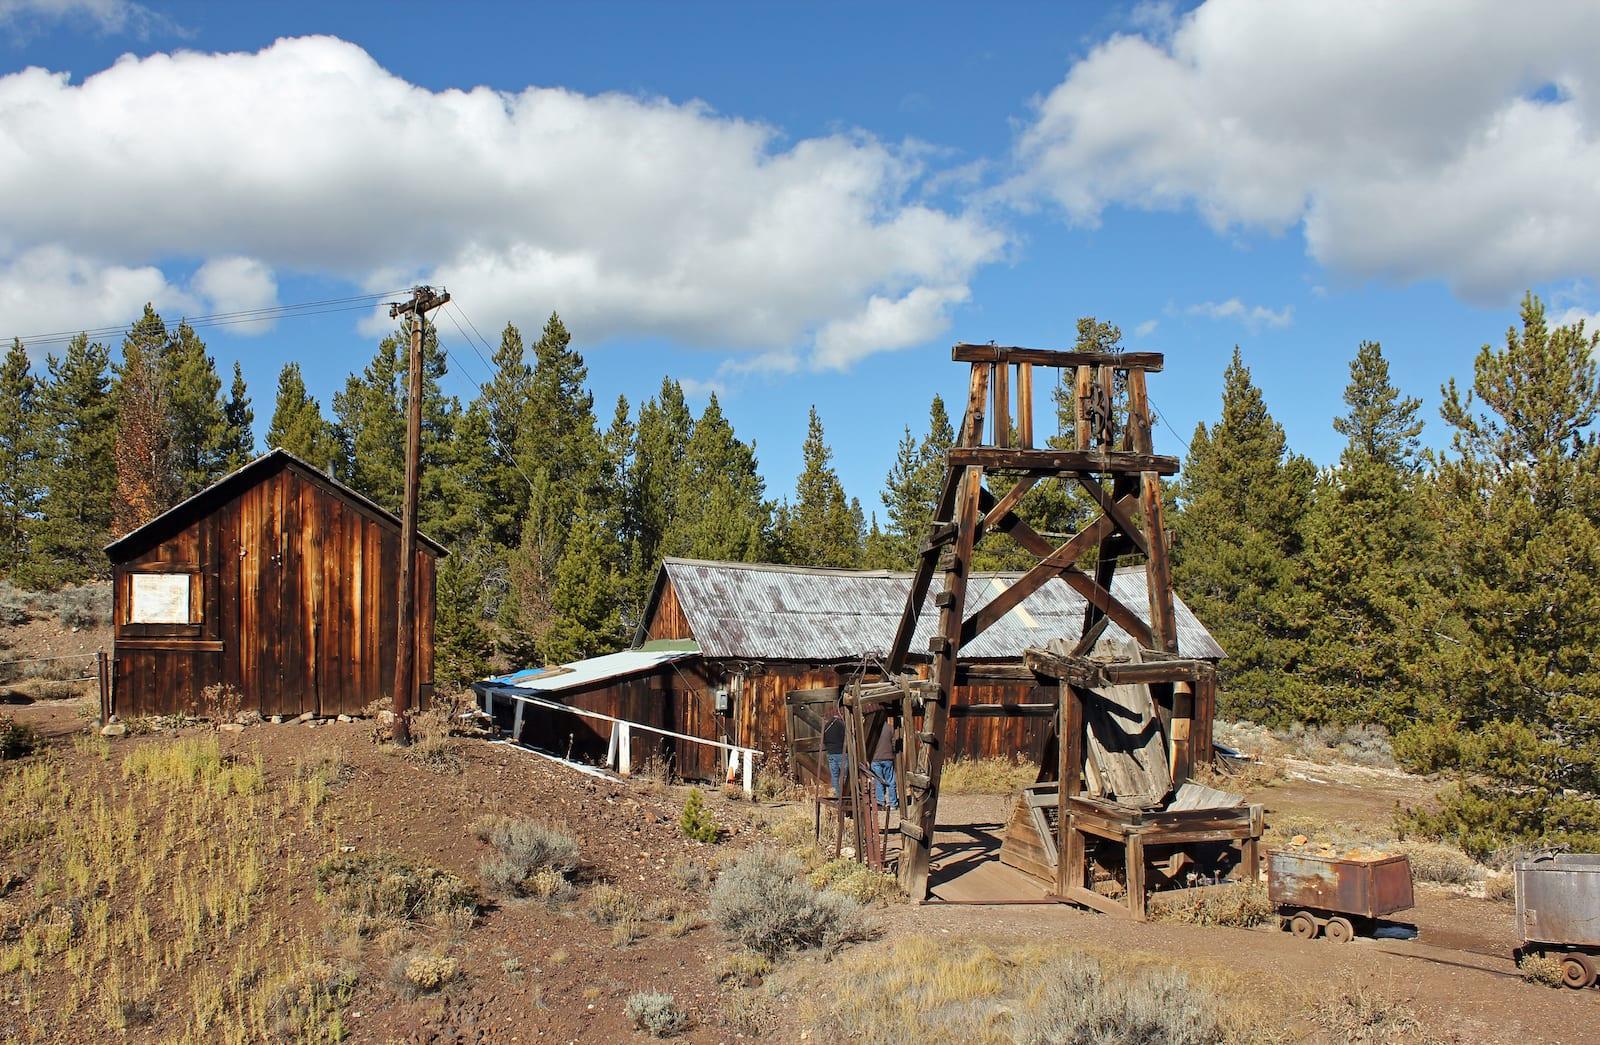 Matchless Mine Leadville Colorado